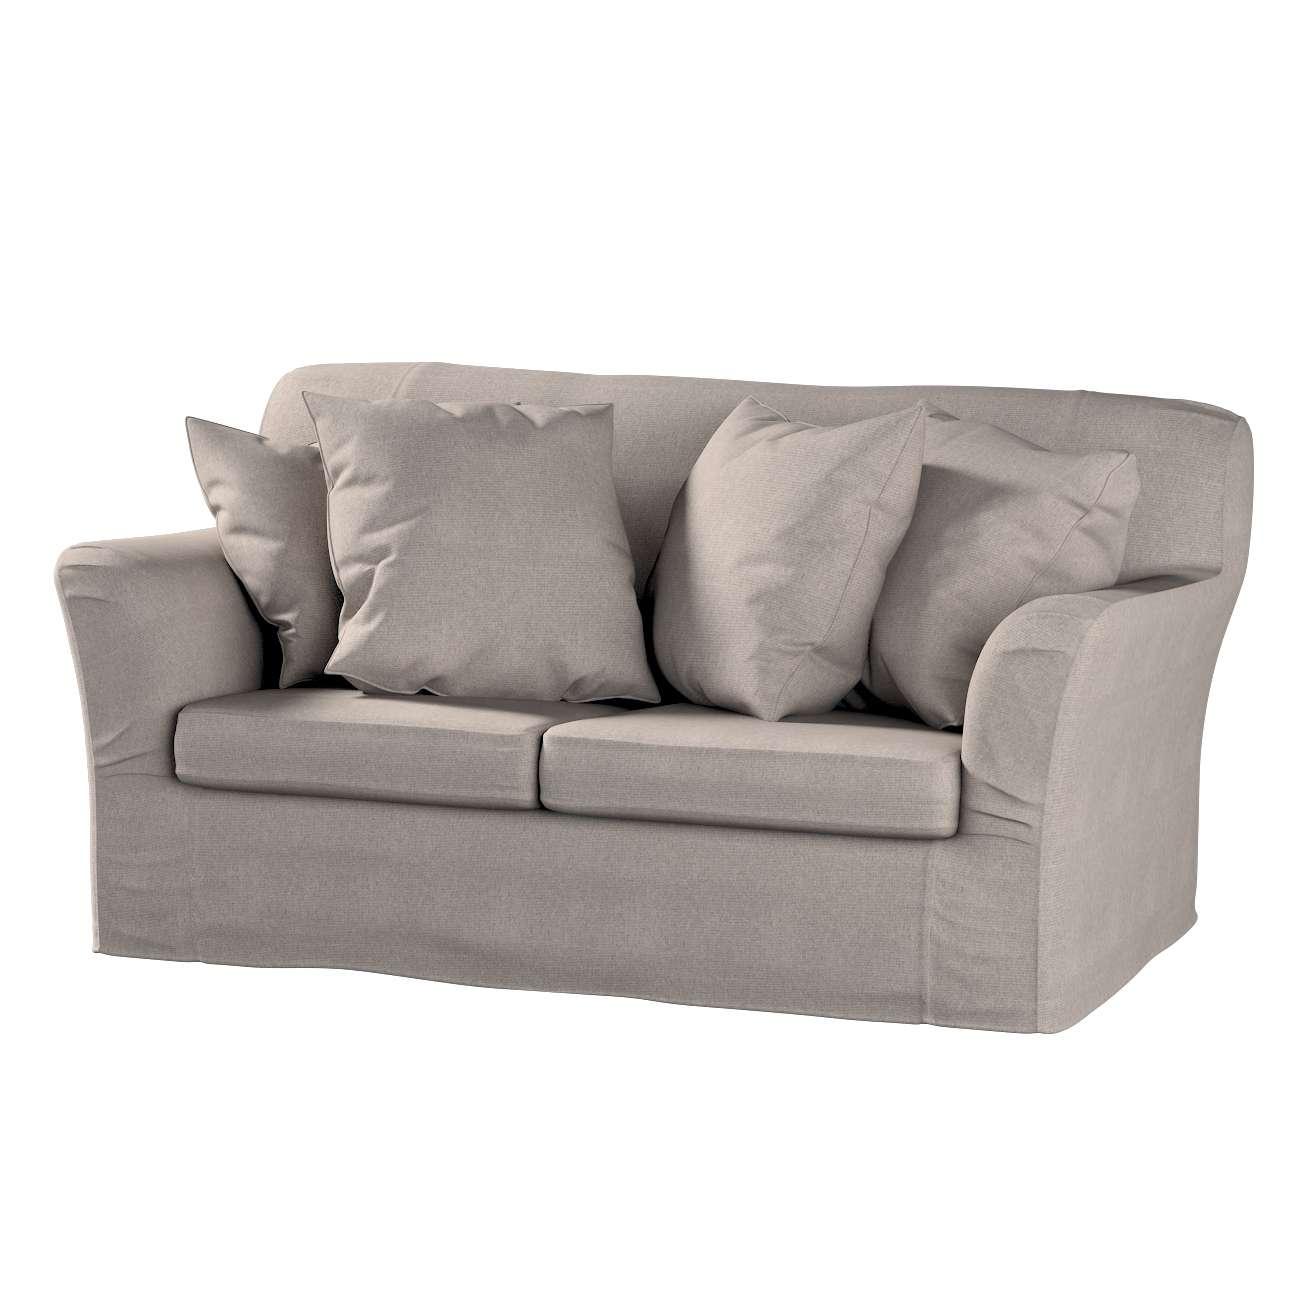 TOMELILLA  dvivietės sofos užvalkalas TOMELILLA dvivietė sofa kolekcijoje Etna , audinys: 705-09